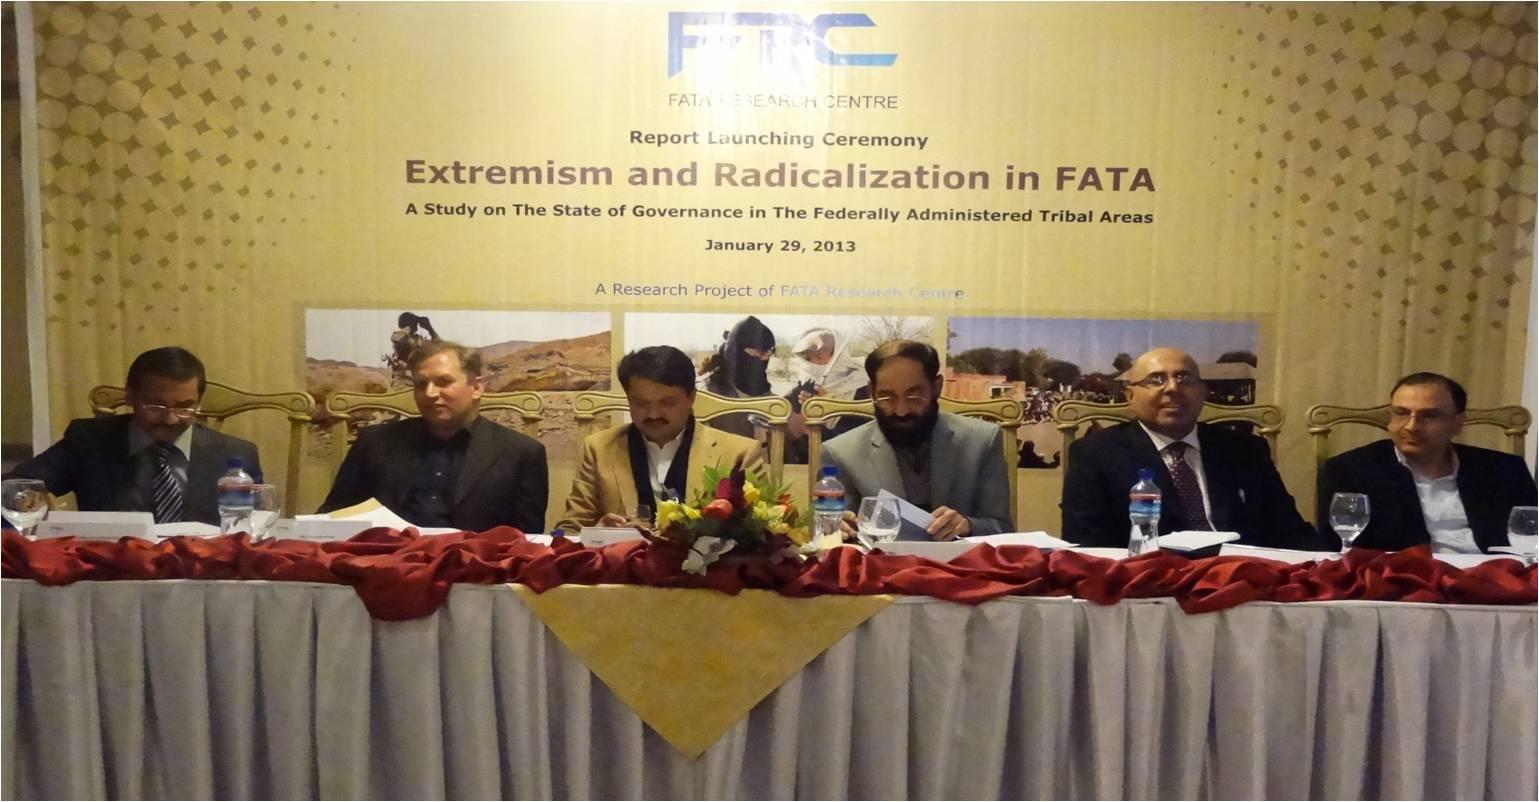 Political administration enjoys immunity from accountability in FATA